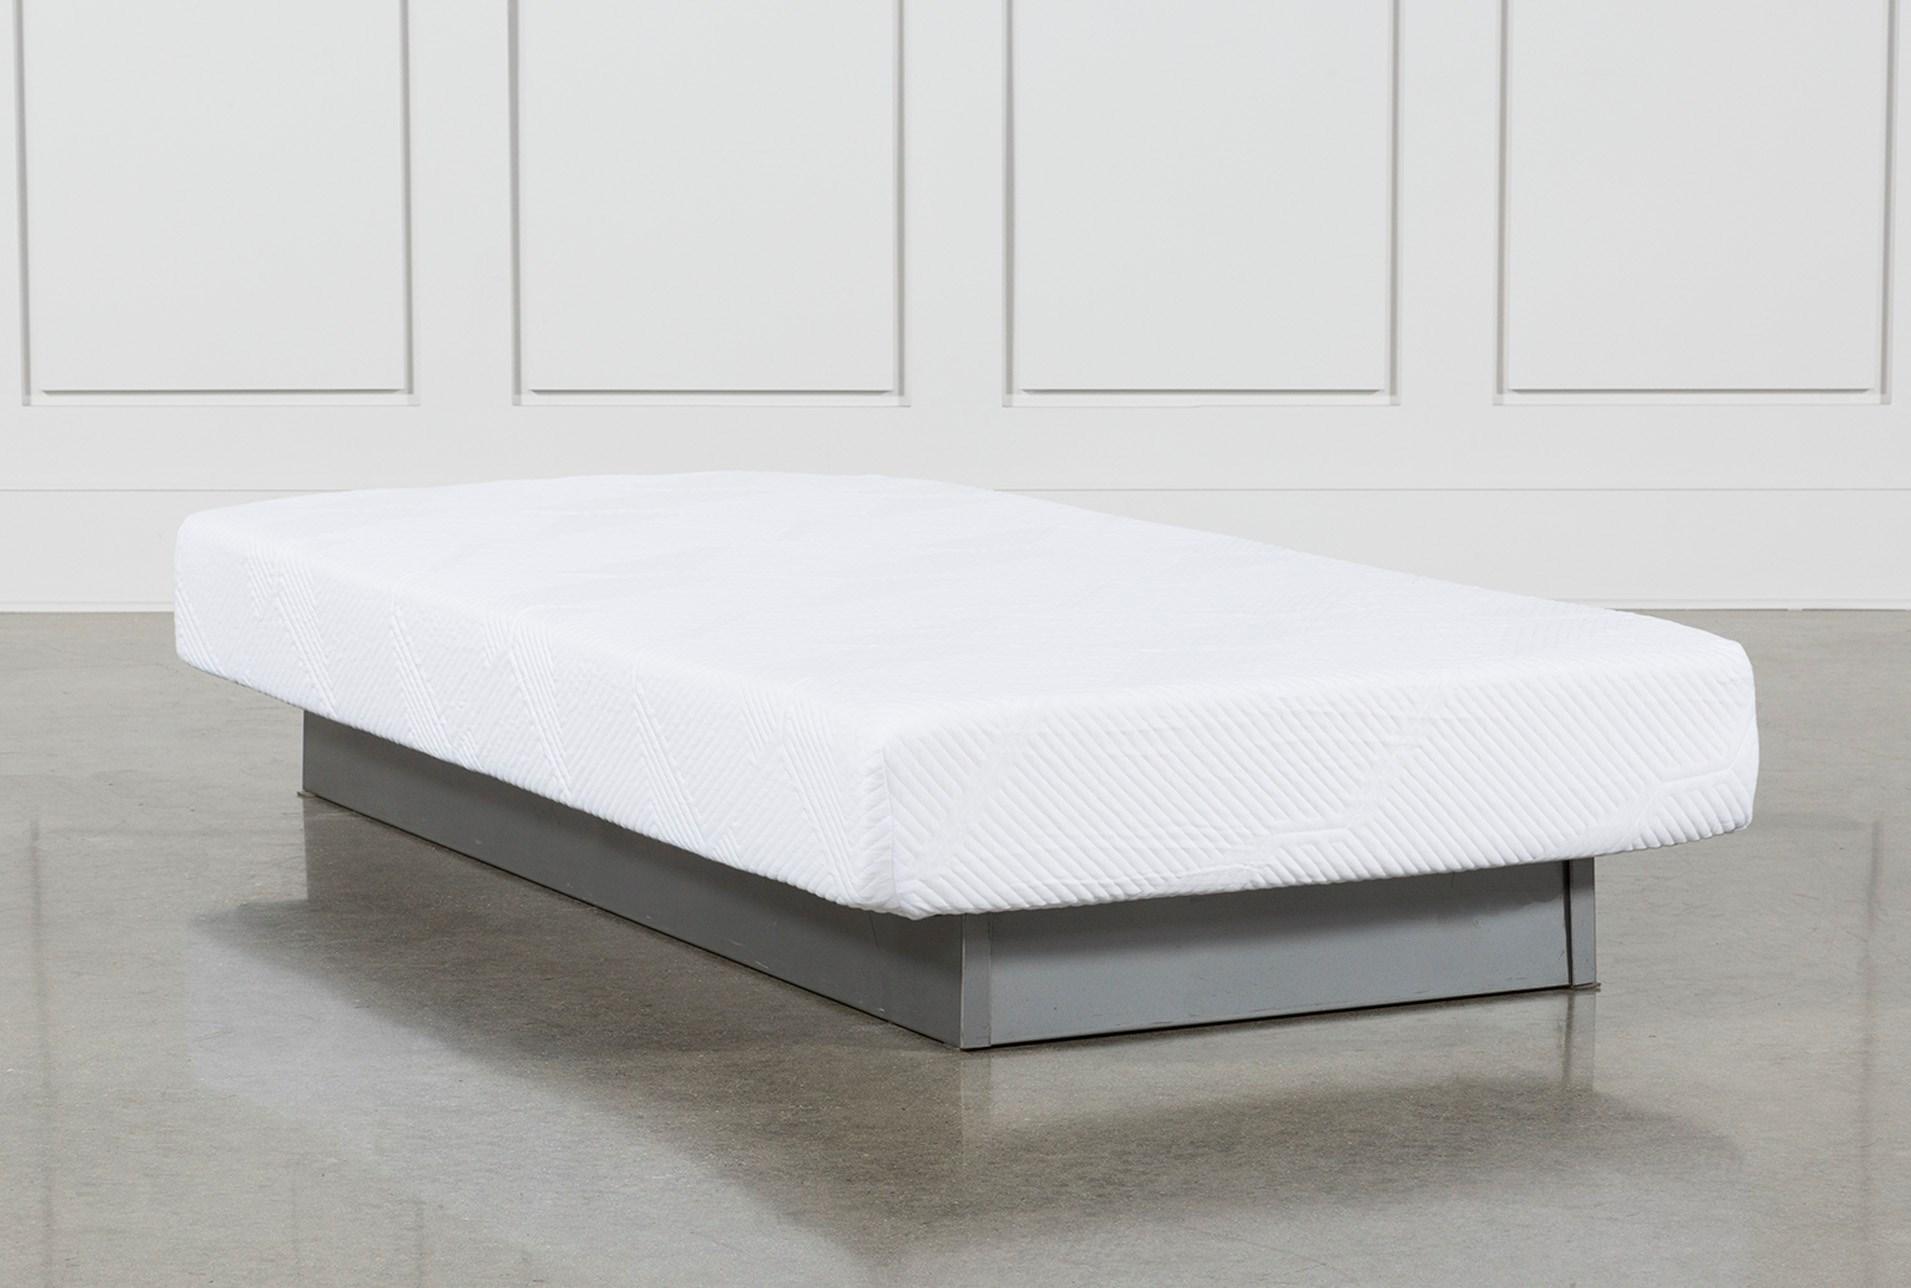 essentials 8 inch foam twin mattress living spaces. Black Bedroom Furniture Sets. Home Design Ideas